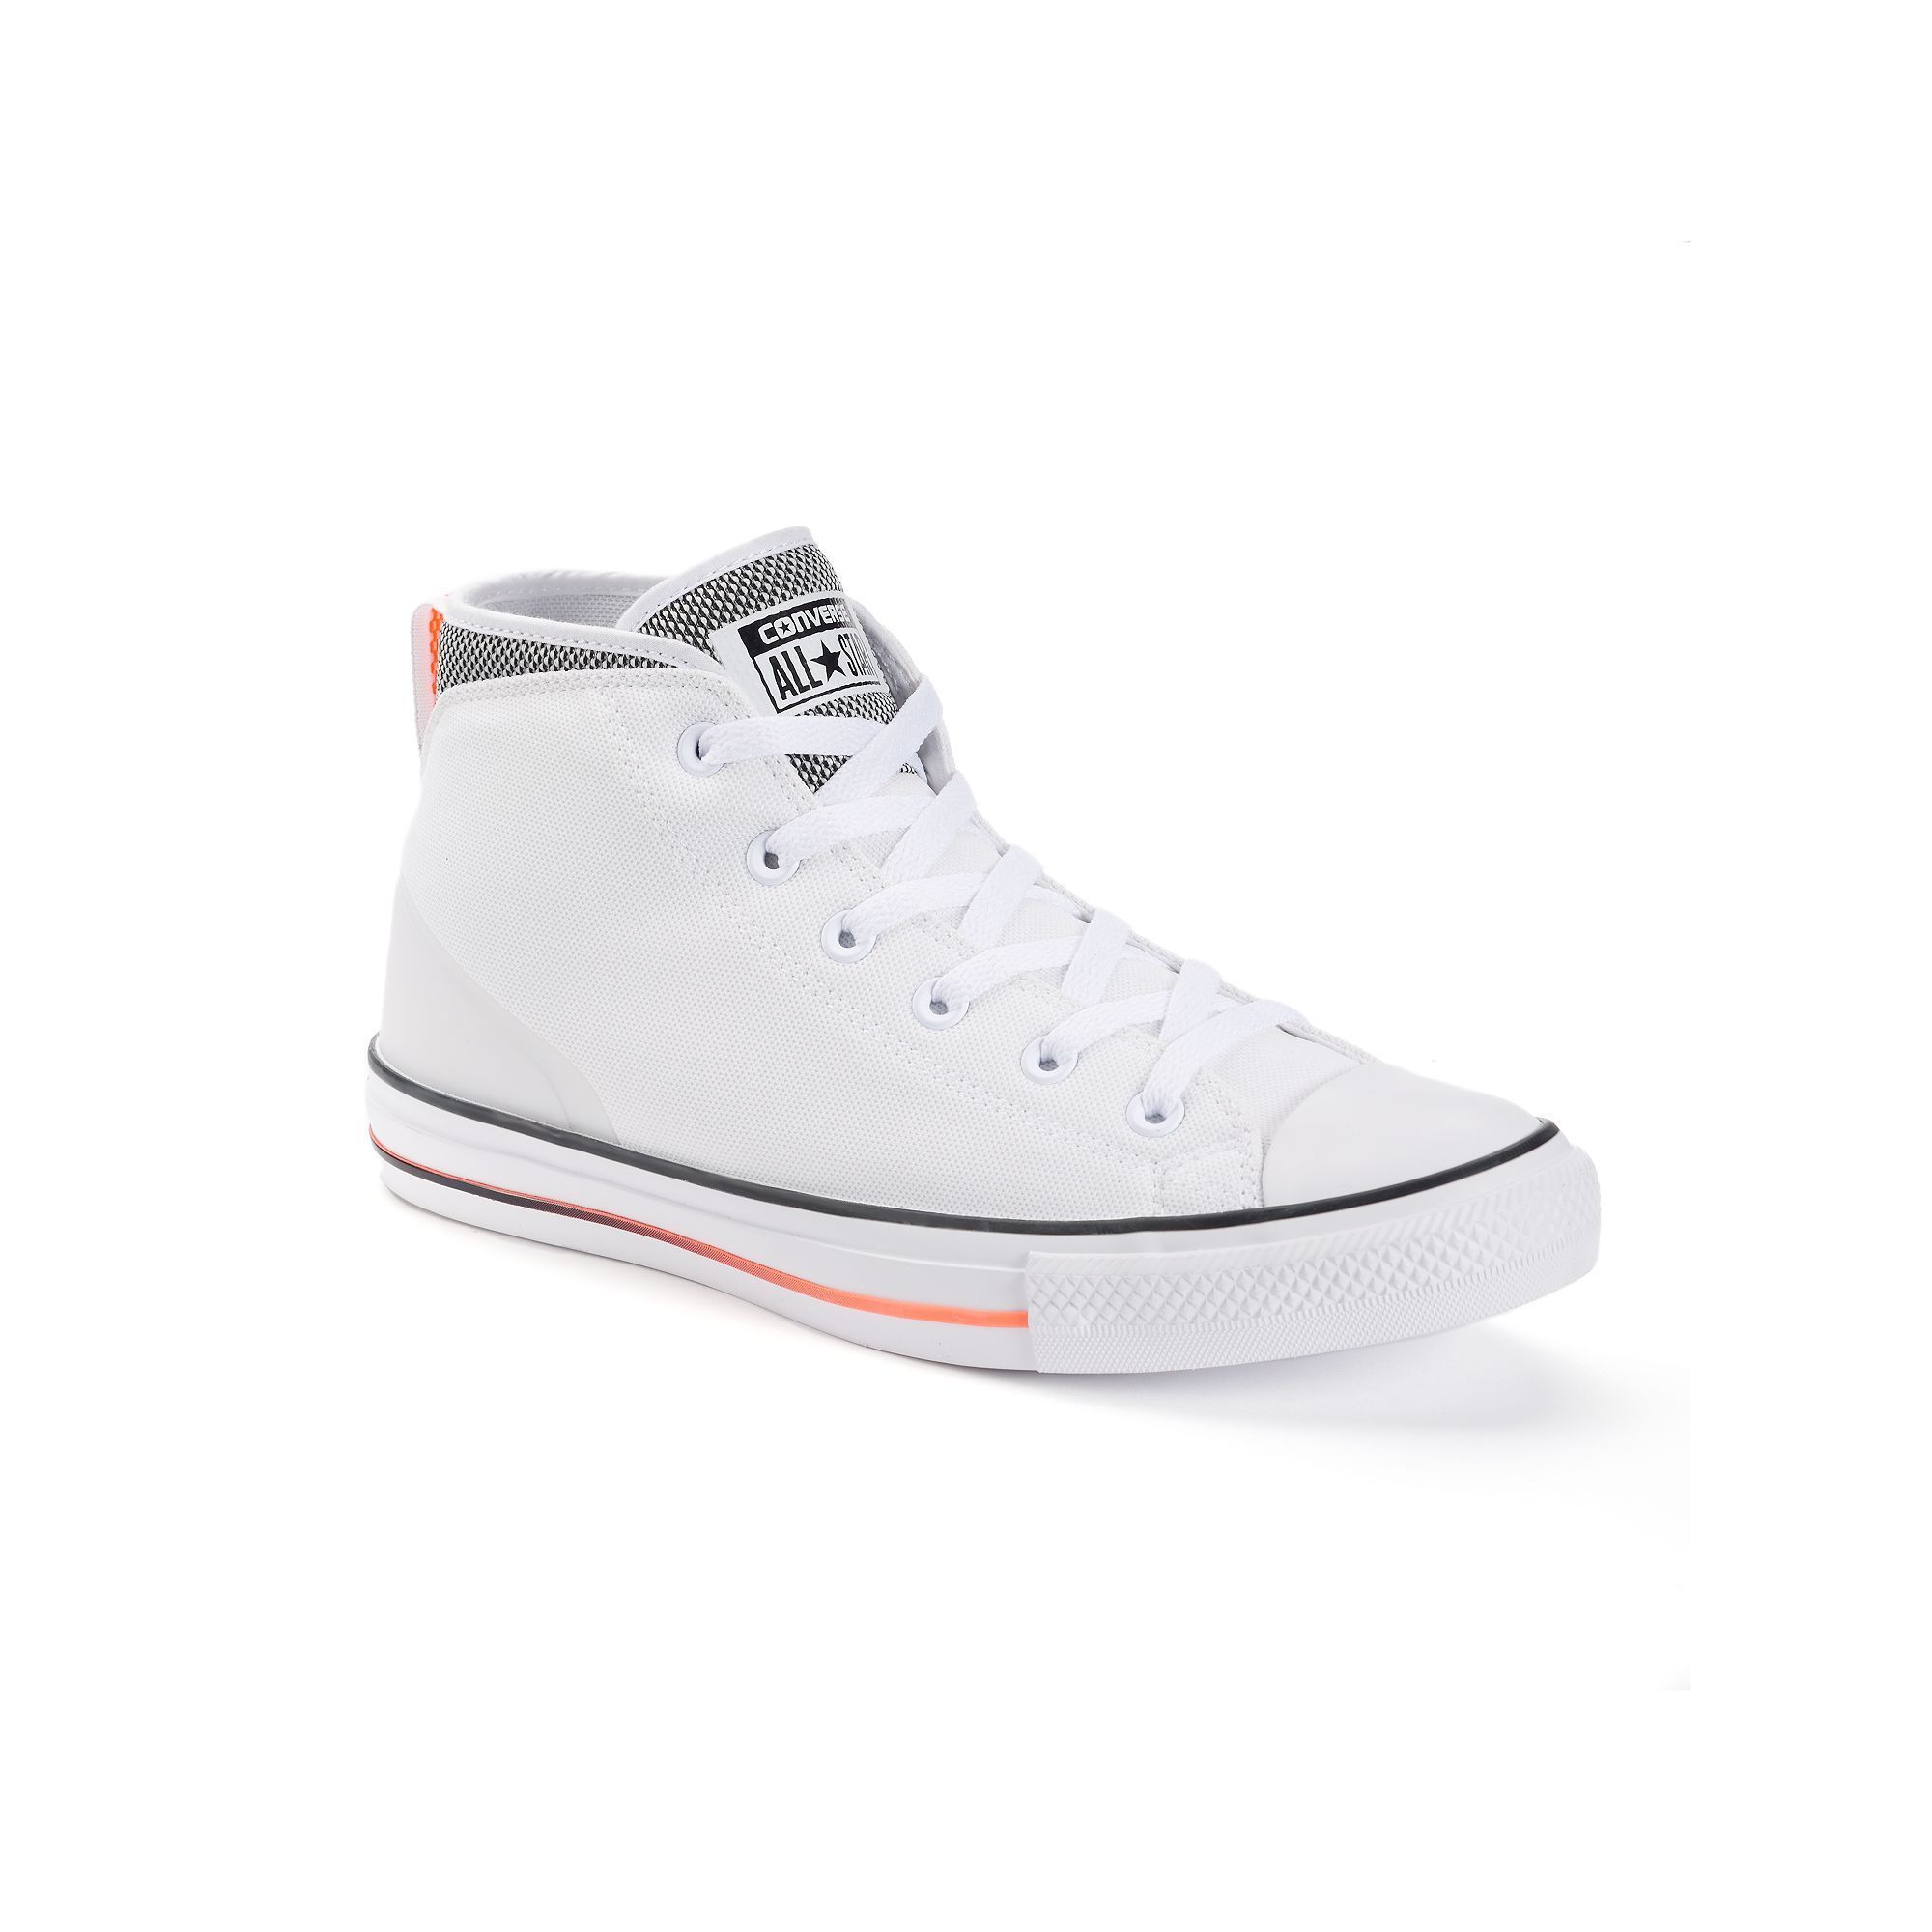 b36f818b6da3 Men s Converse Chuck Taylor All Star Syde Street Mid Shoes